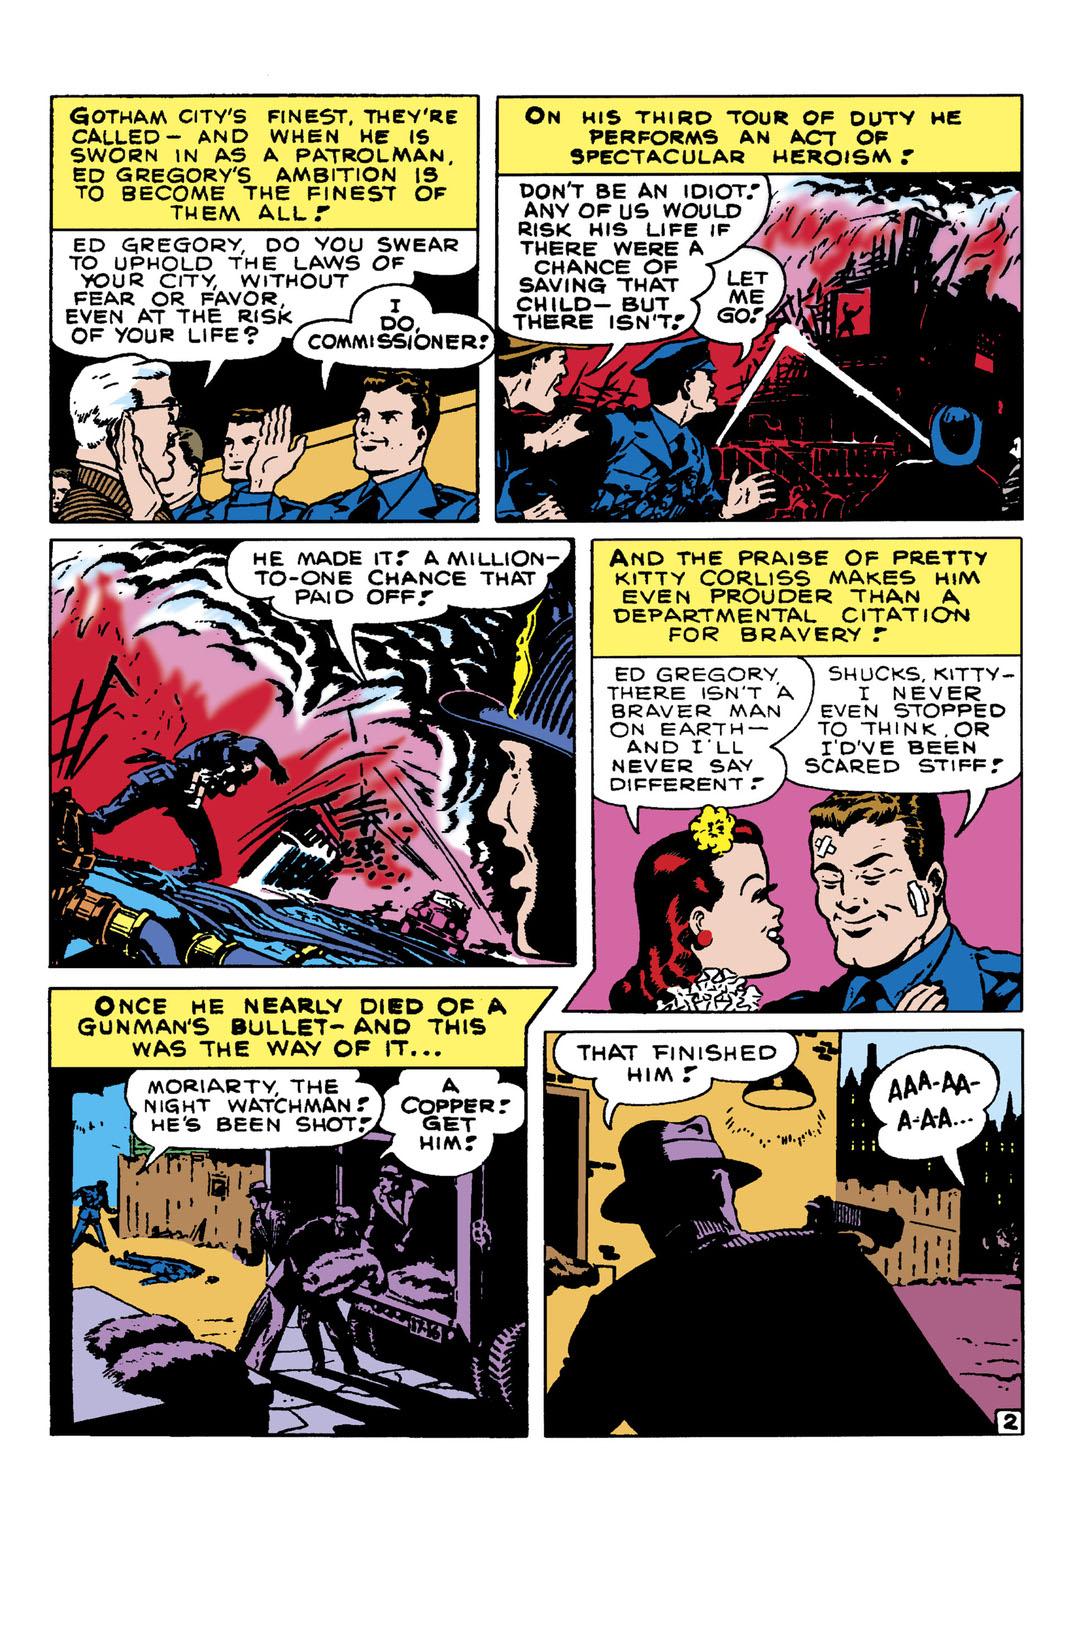 Read Detective Comics (1937-) #108 on DC Universe